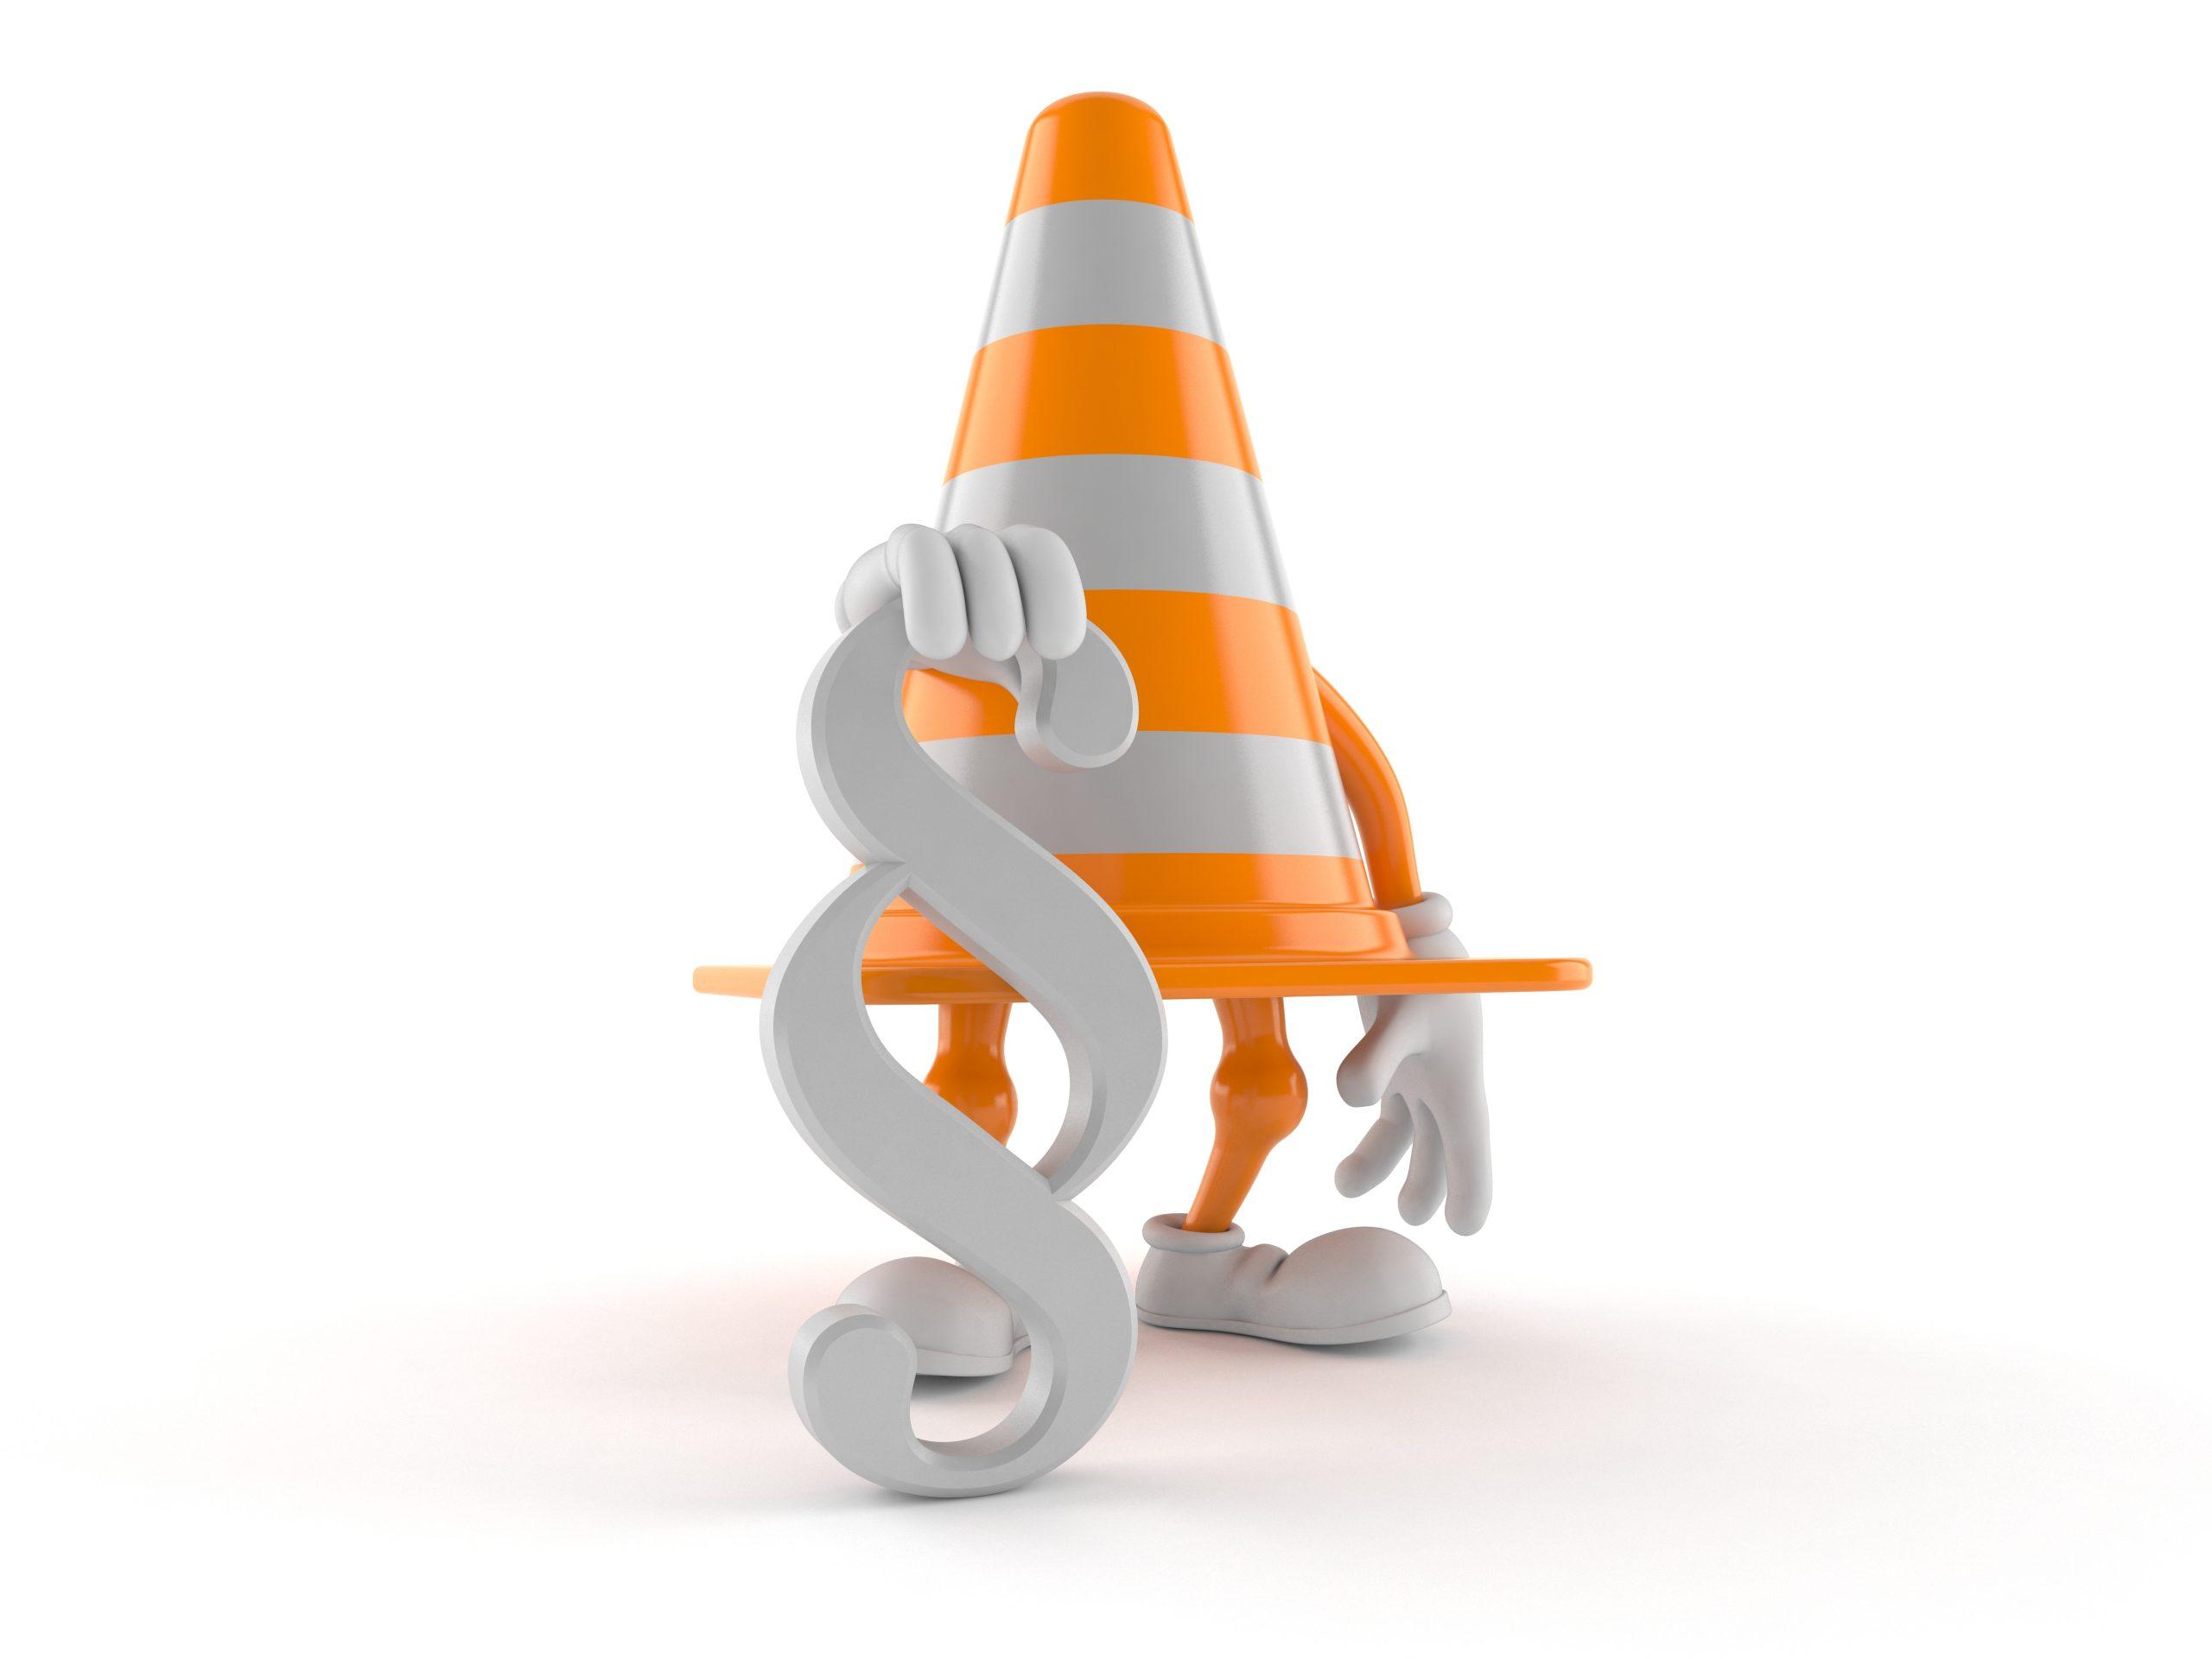 https://depositphotos.com/357659784/stock-photo-traffic-cone-character-paragraph-symbol.html